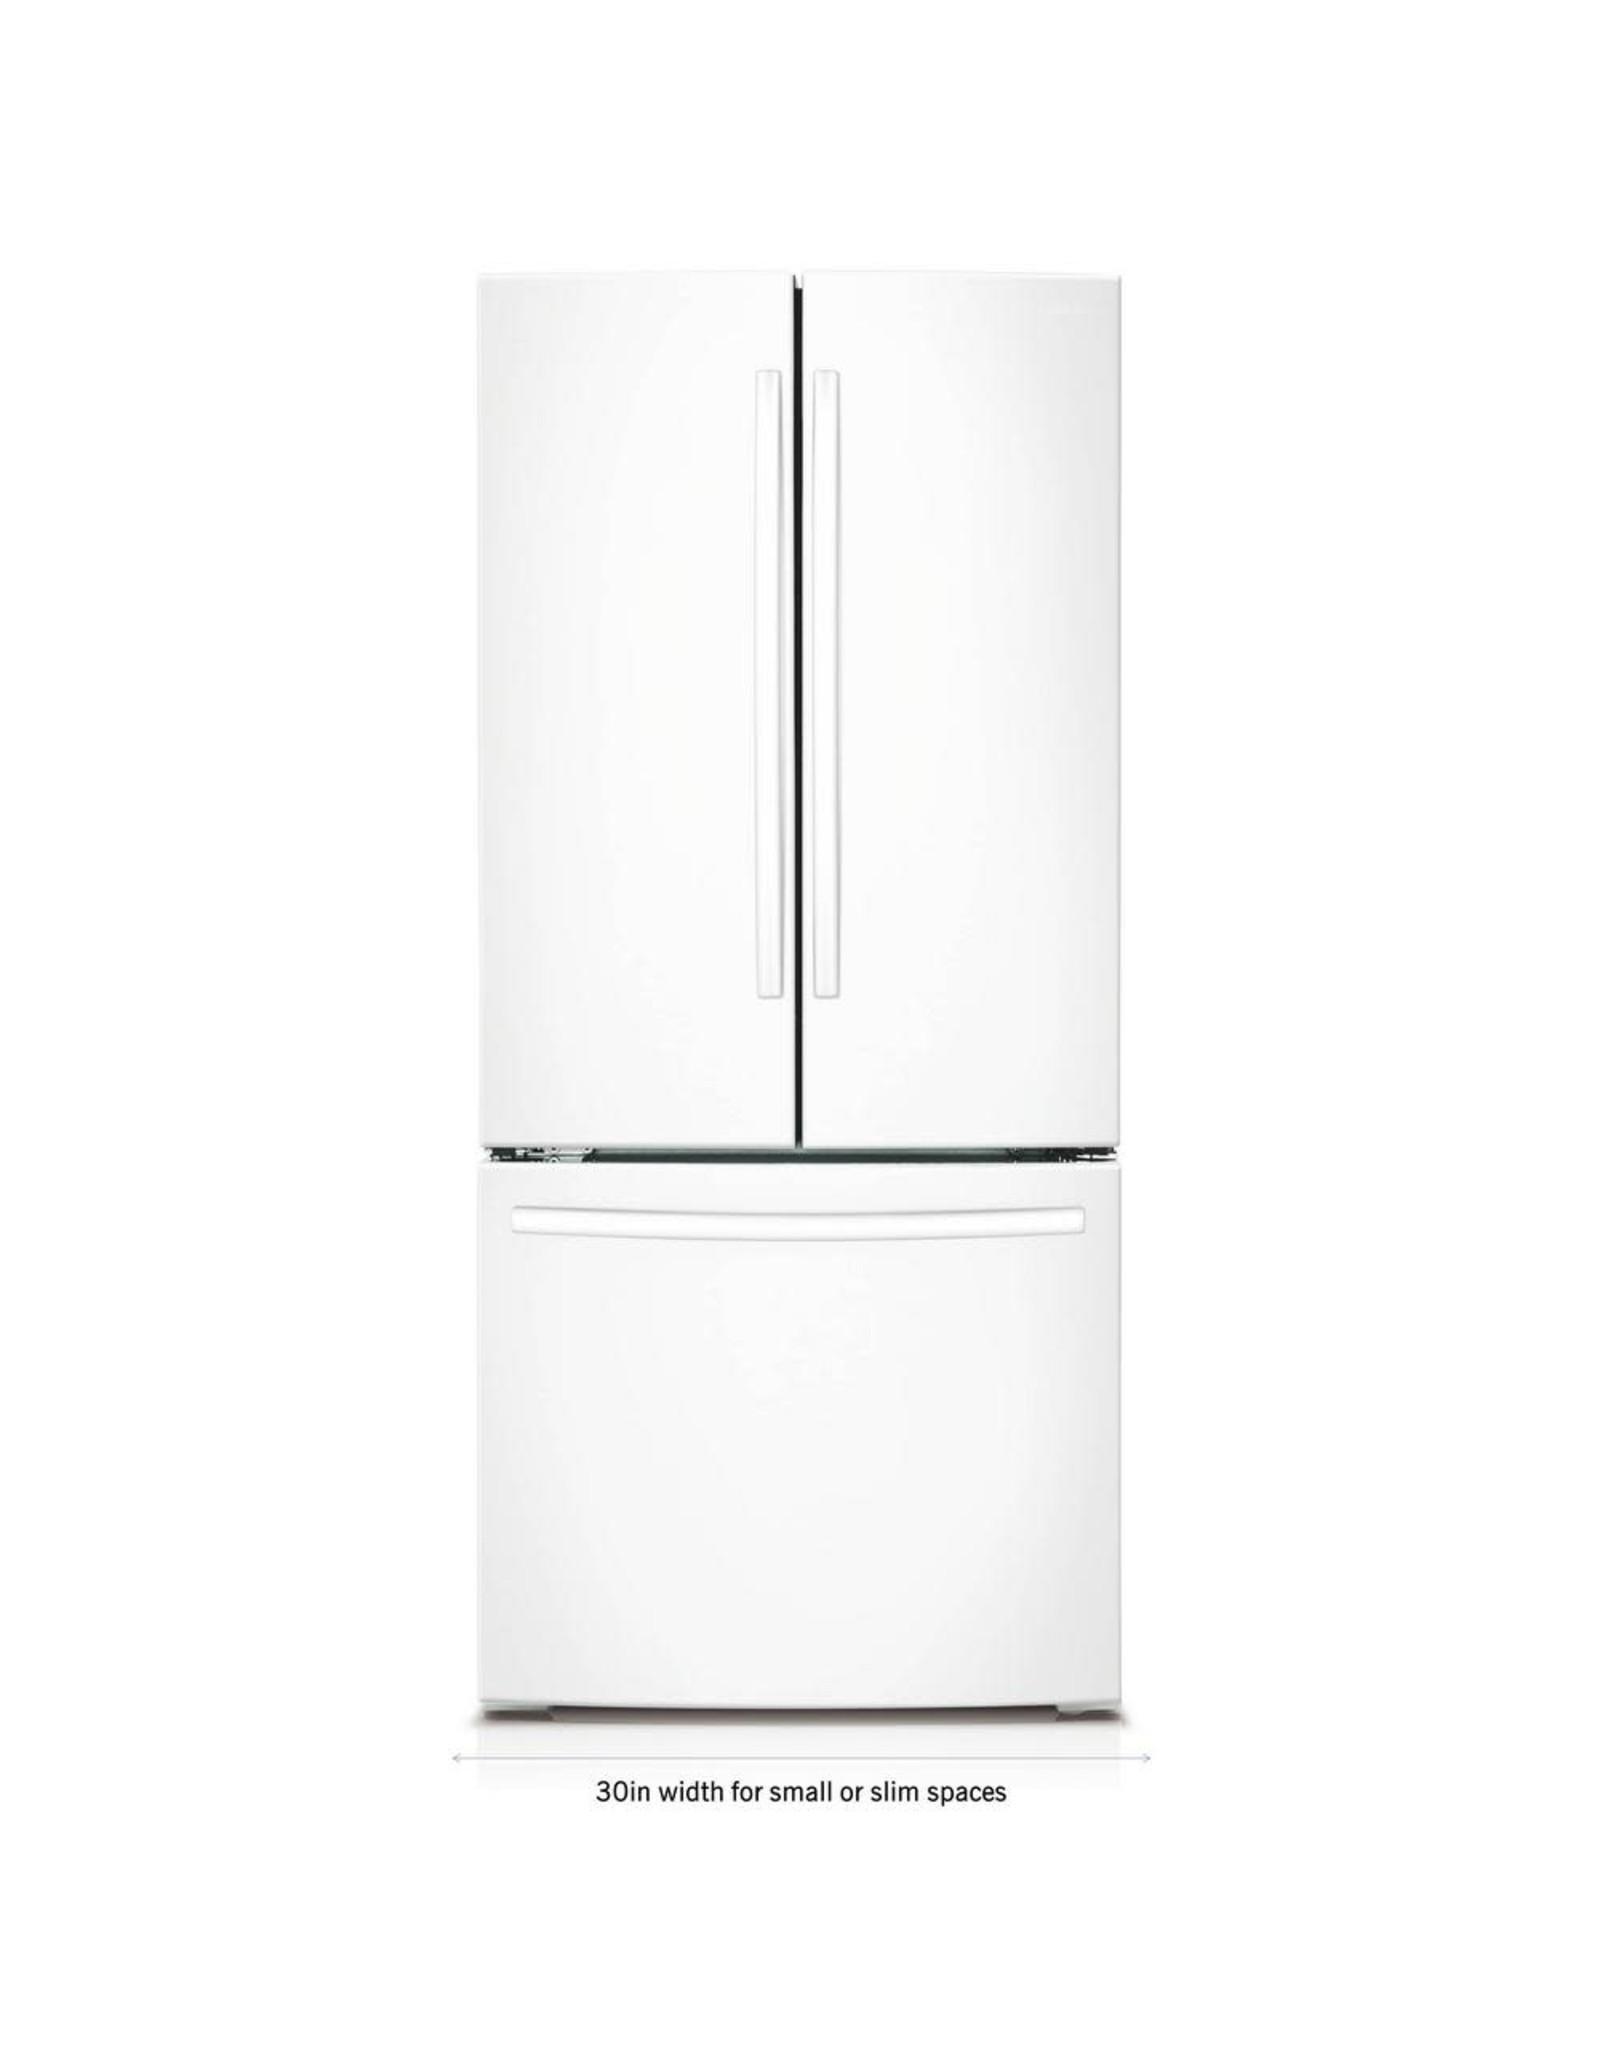 SAMSUNG RF220NCTAWW Samsung 21.6 Cu.Ft. French Door Refrigerator